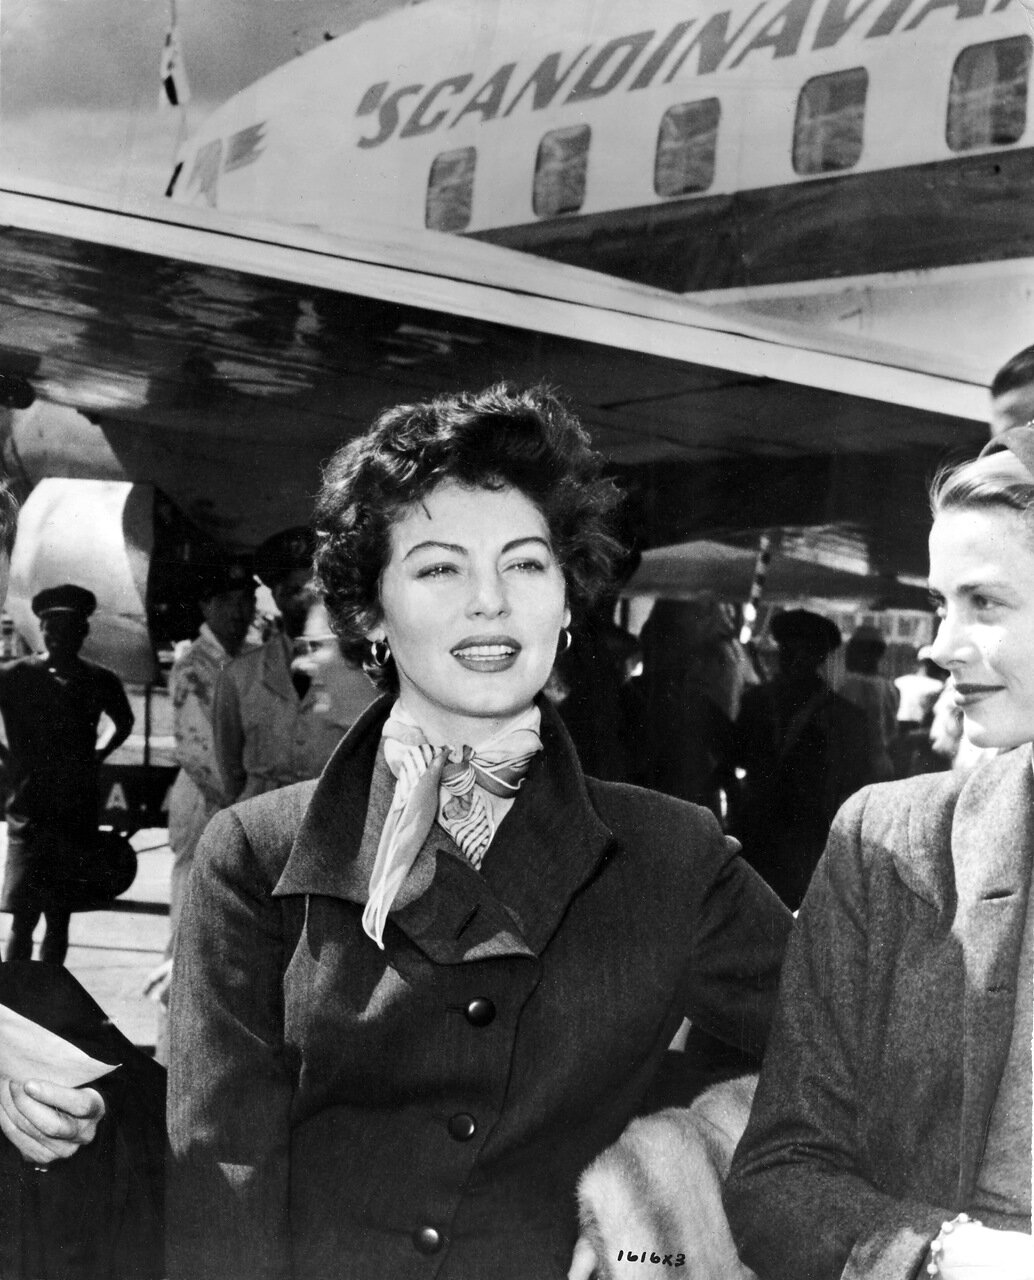 AVA GARDNER [1922 - 1990]American Actresswith GRACE KELLY [1929 - 1982] arriving at Nairobi airport to film MOGAMBO [1953]